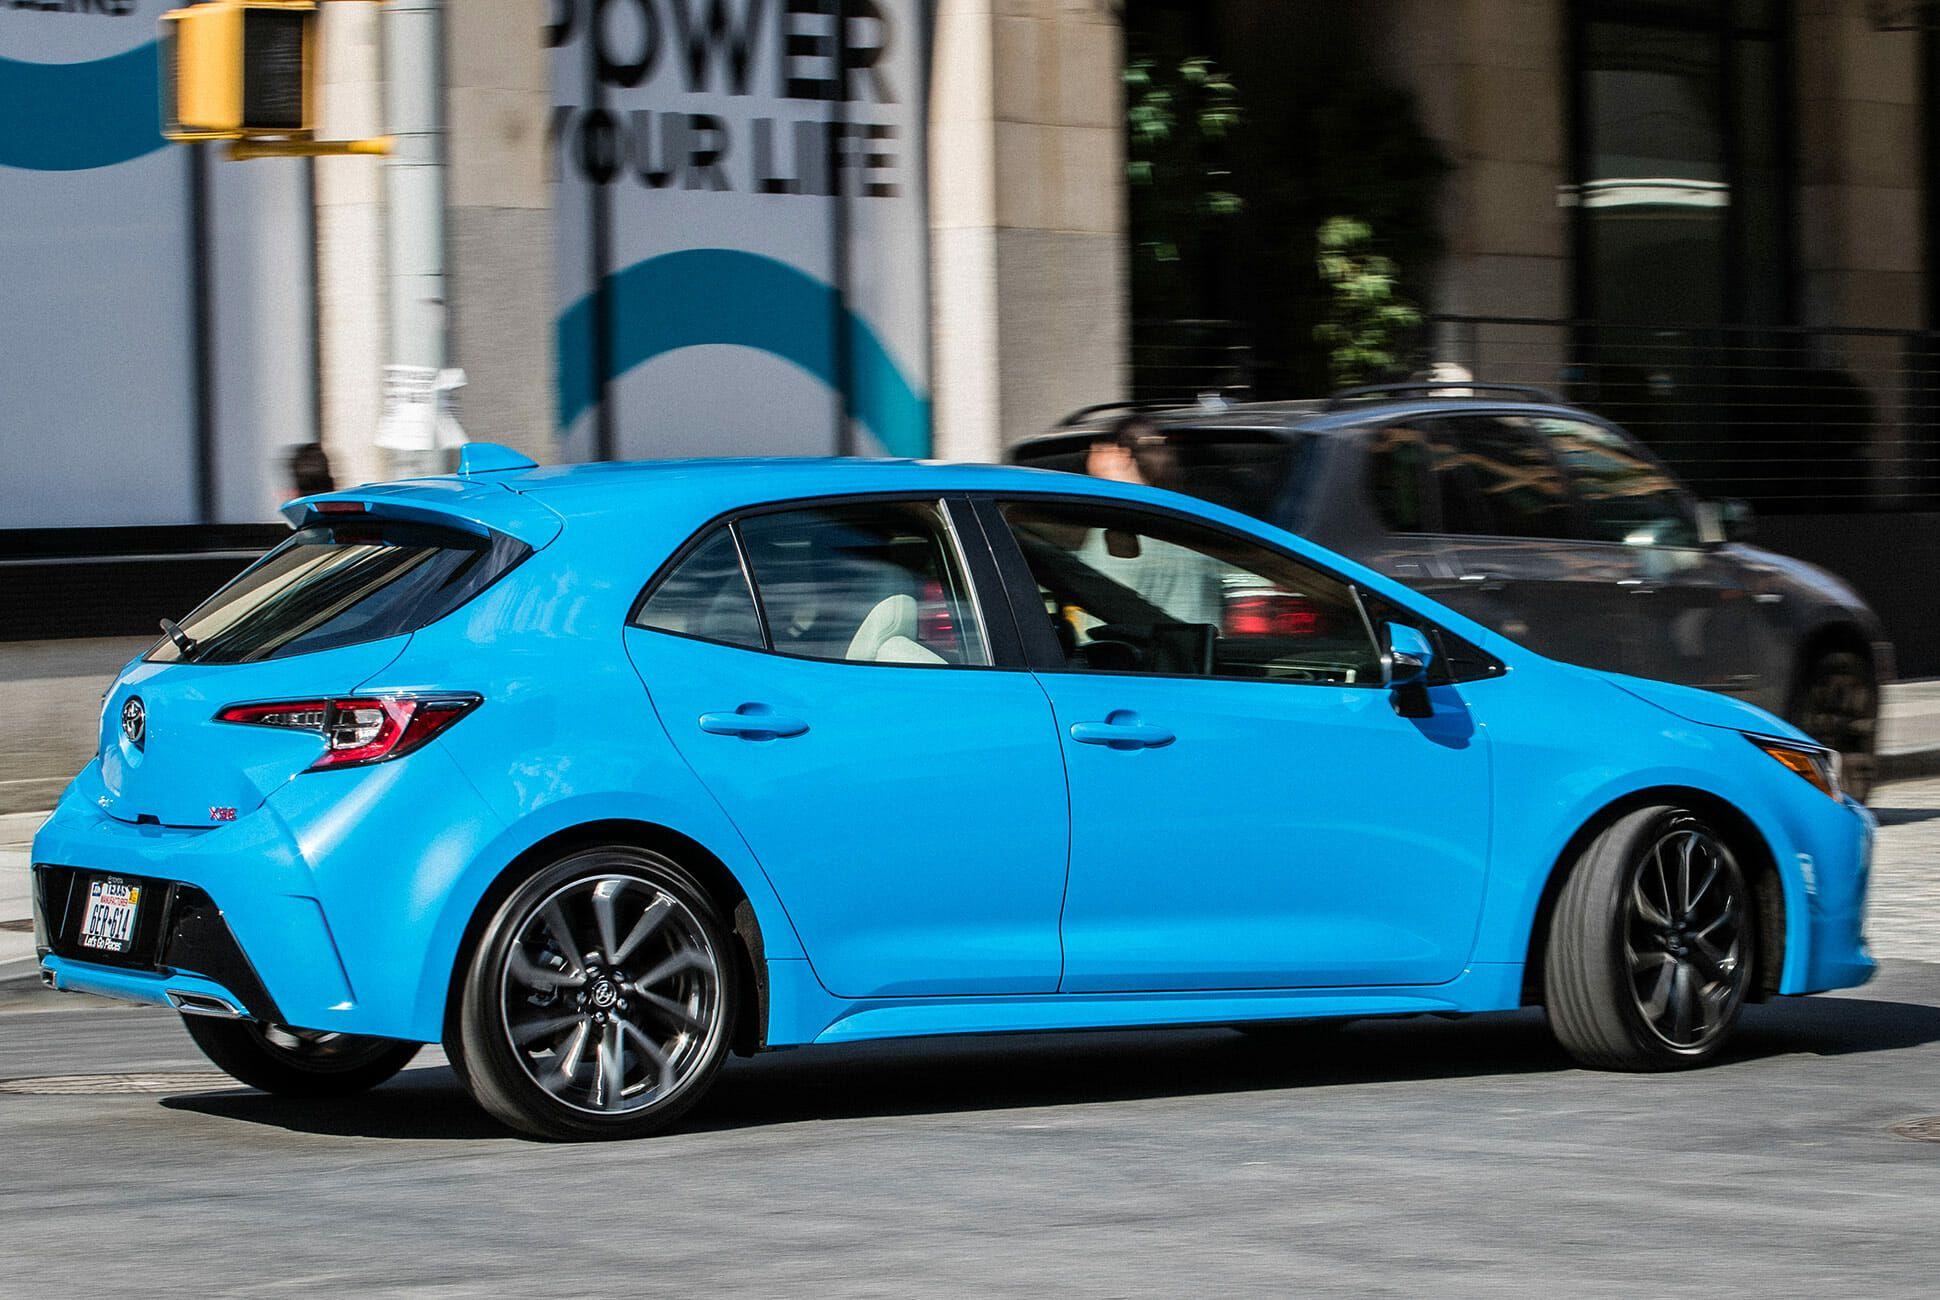 Toyota-Corolla-XSE-Hatch-Review-gear-patrol-slide-8